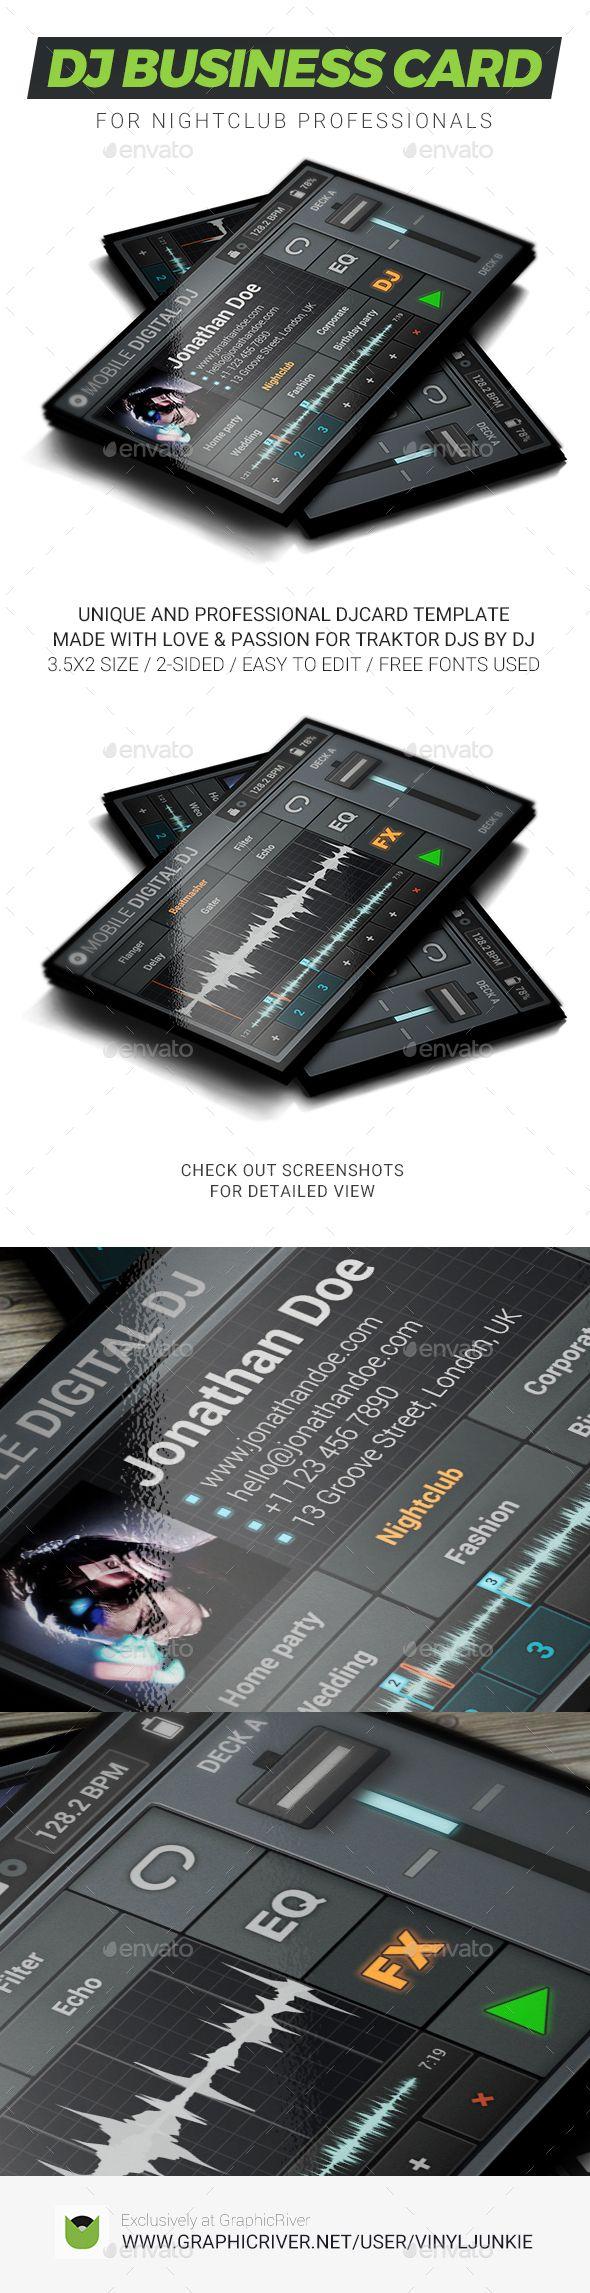 Mobile digital dj business card dj business cards business mobile digital dj business card reheart Image collections